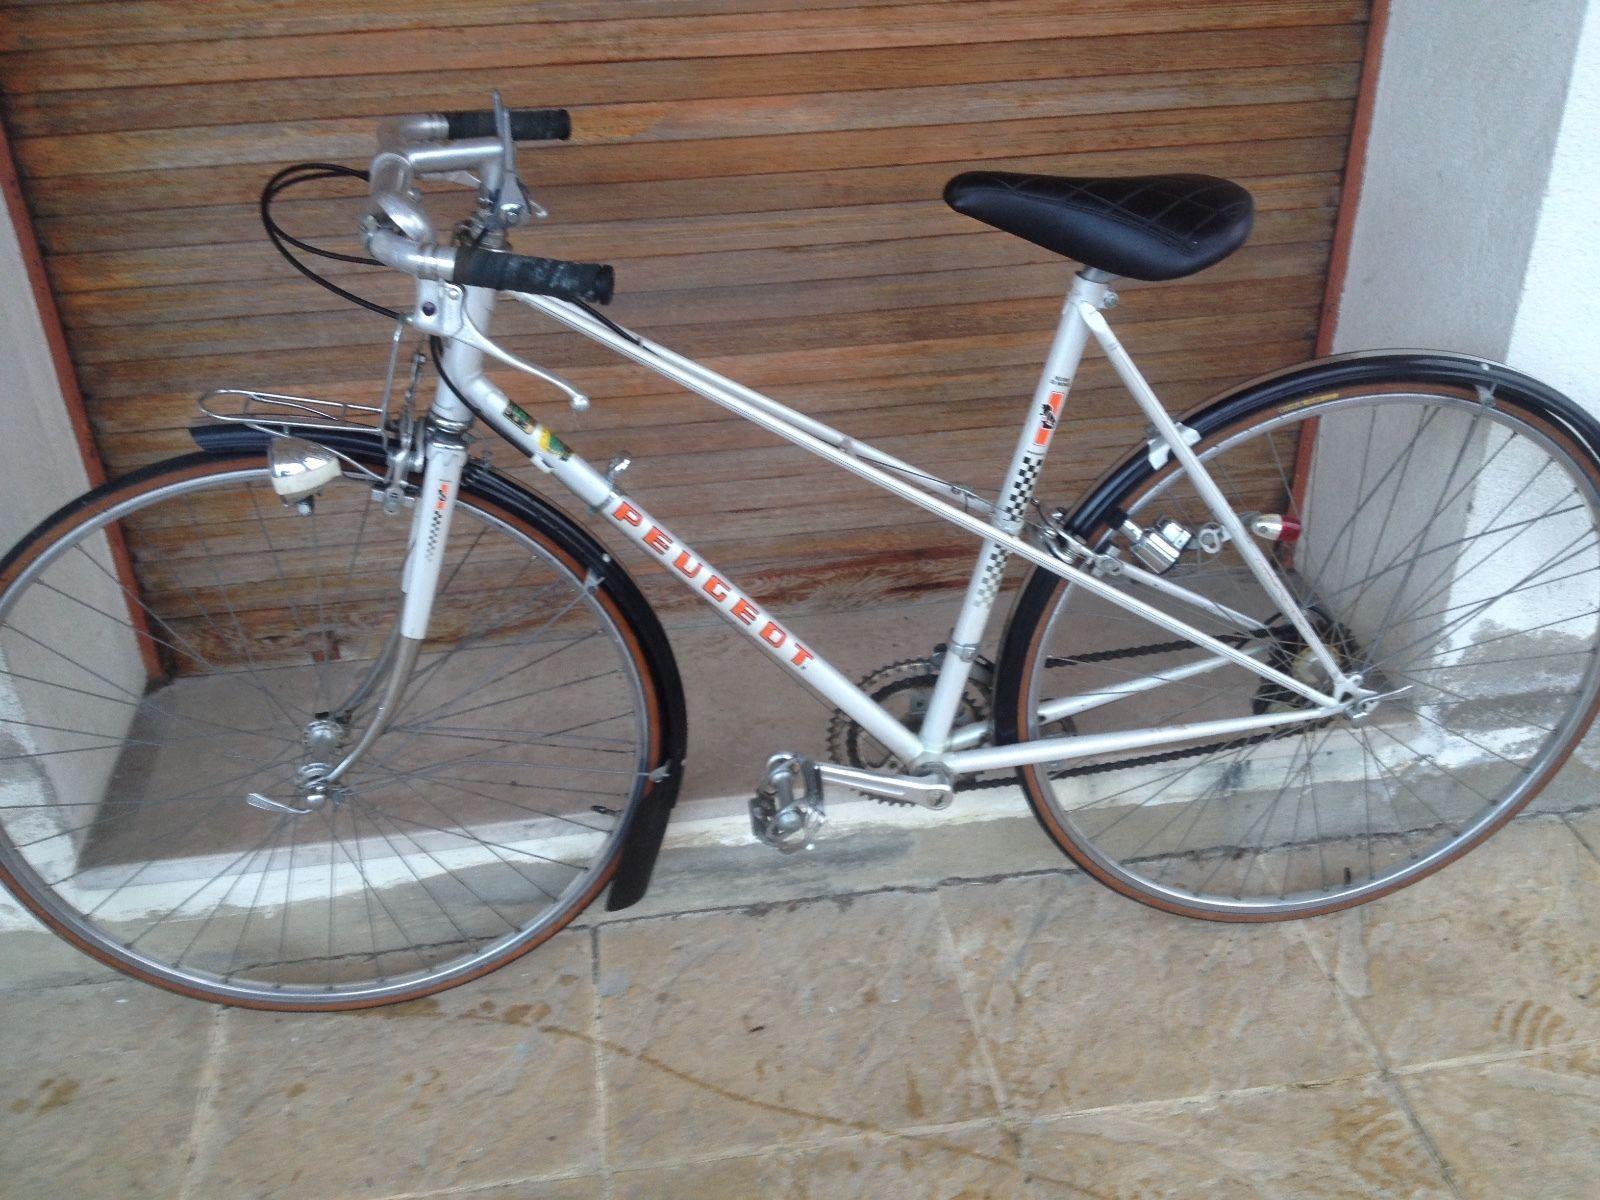 velo peugeot pk65 lady reynolds 531/vintage french lady bike